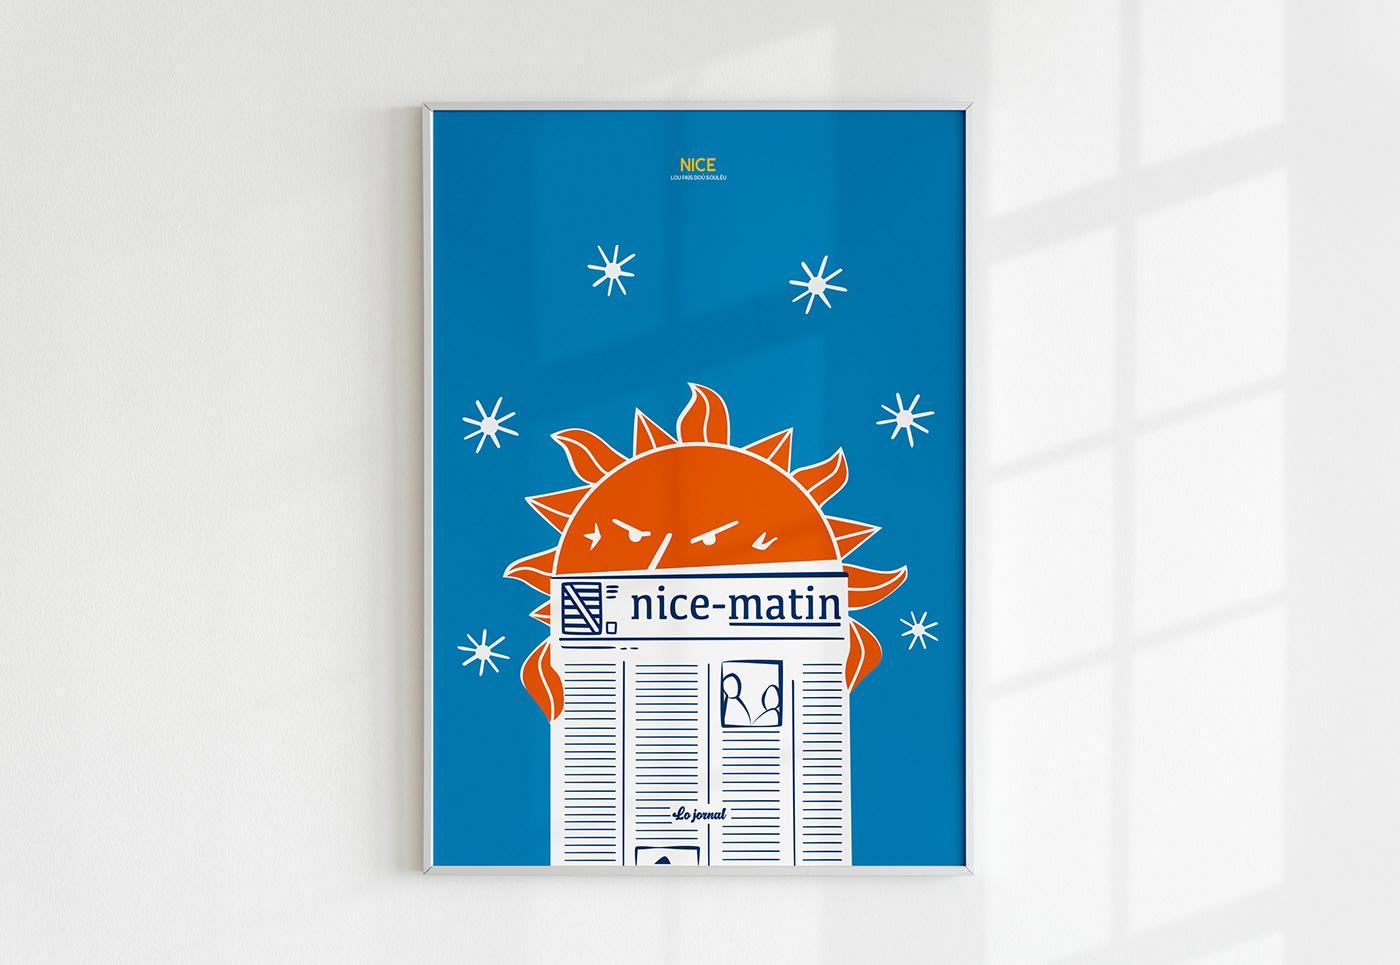 #ilovenice affiche Nice french riviera issa nissa lecoupdulapin nice matin nissa nissarde poster Nice Ville de Nice